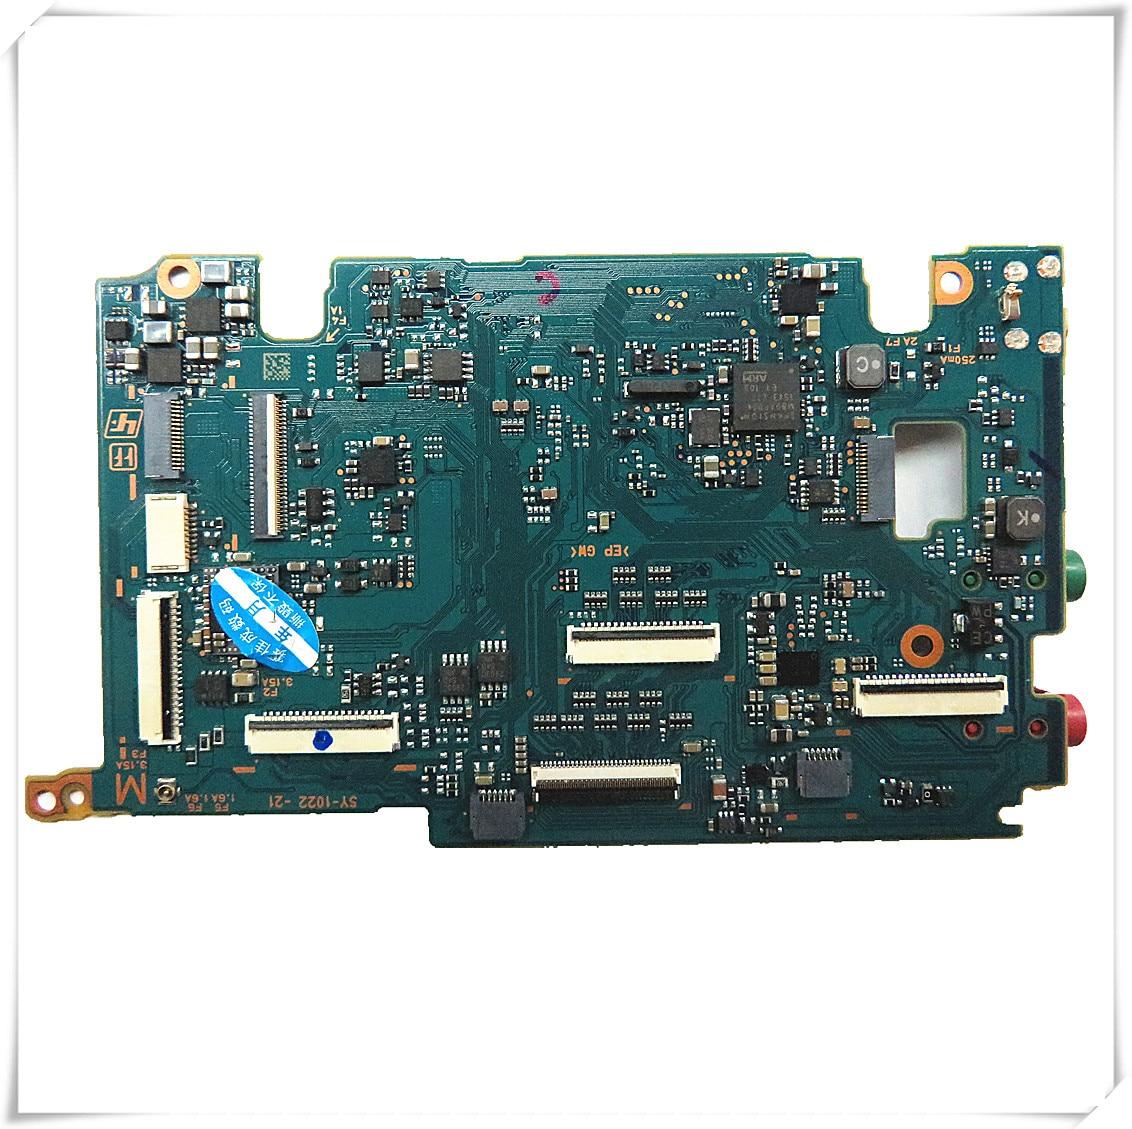 100% Original  A7 Motherboard For SONY A7 Mainboard A7 Main Board A7 Camera Repair Parts